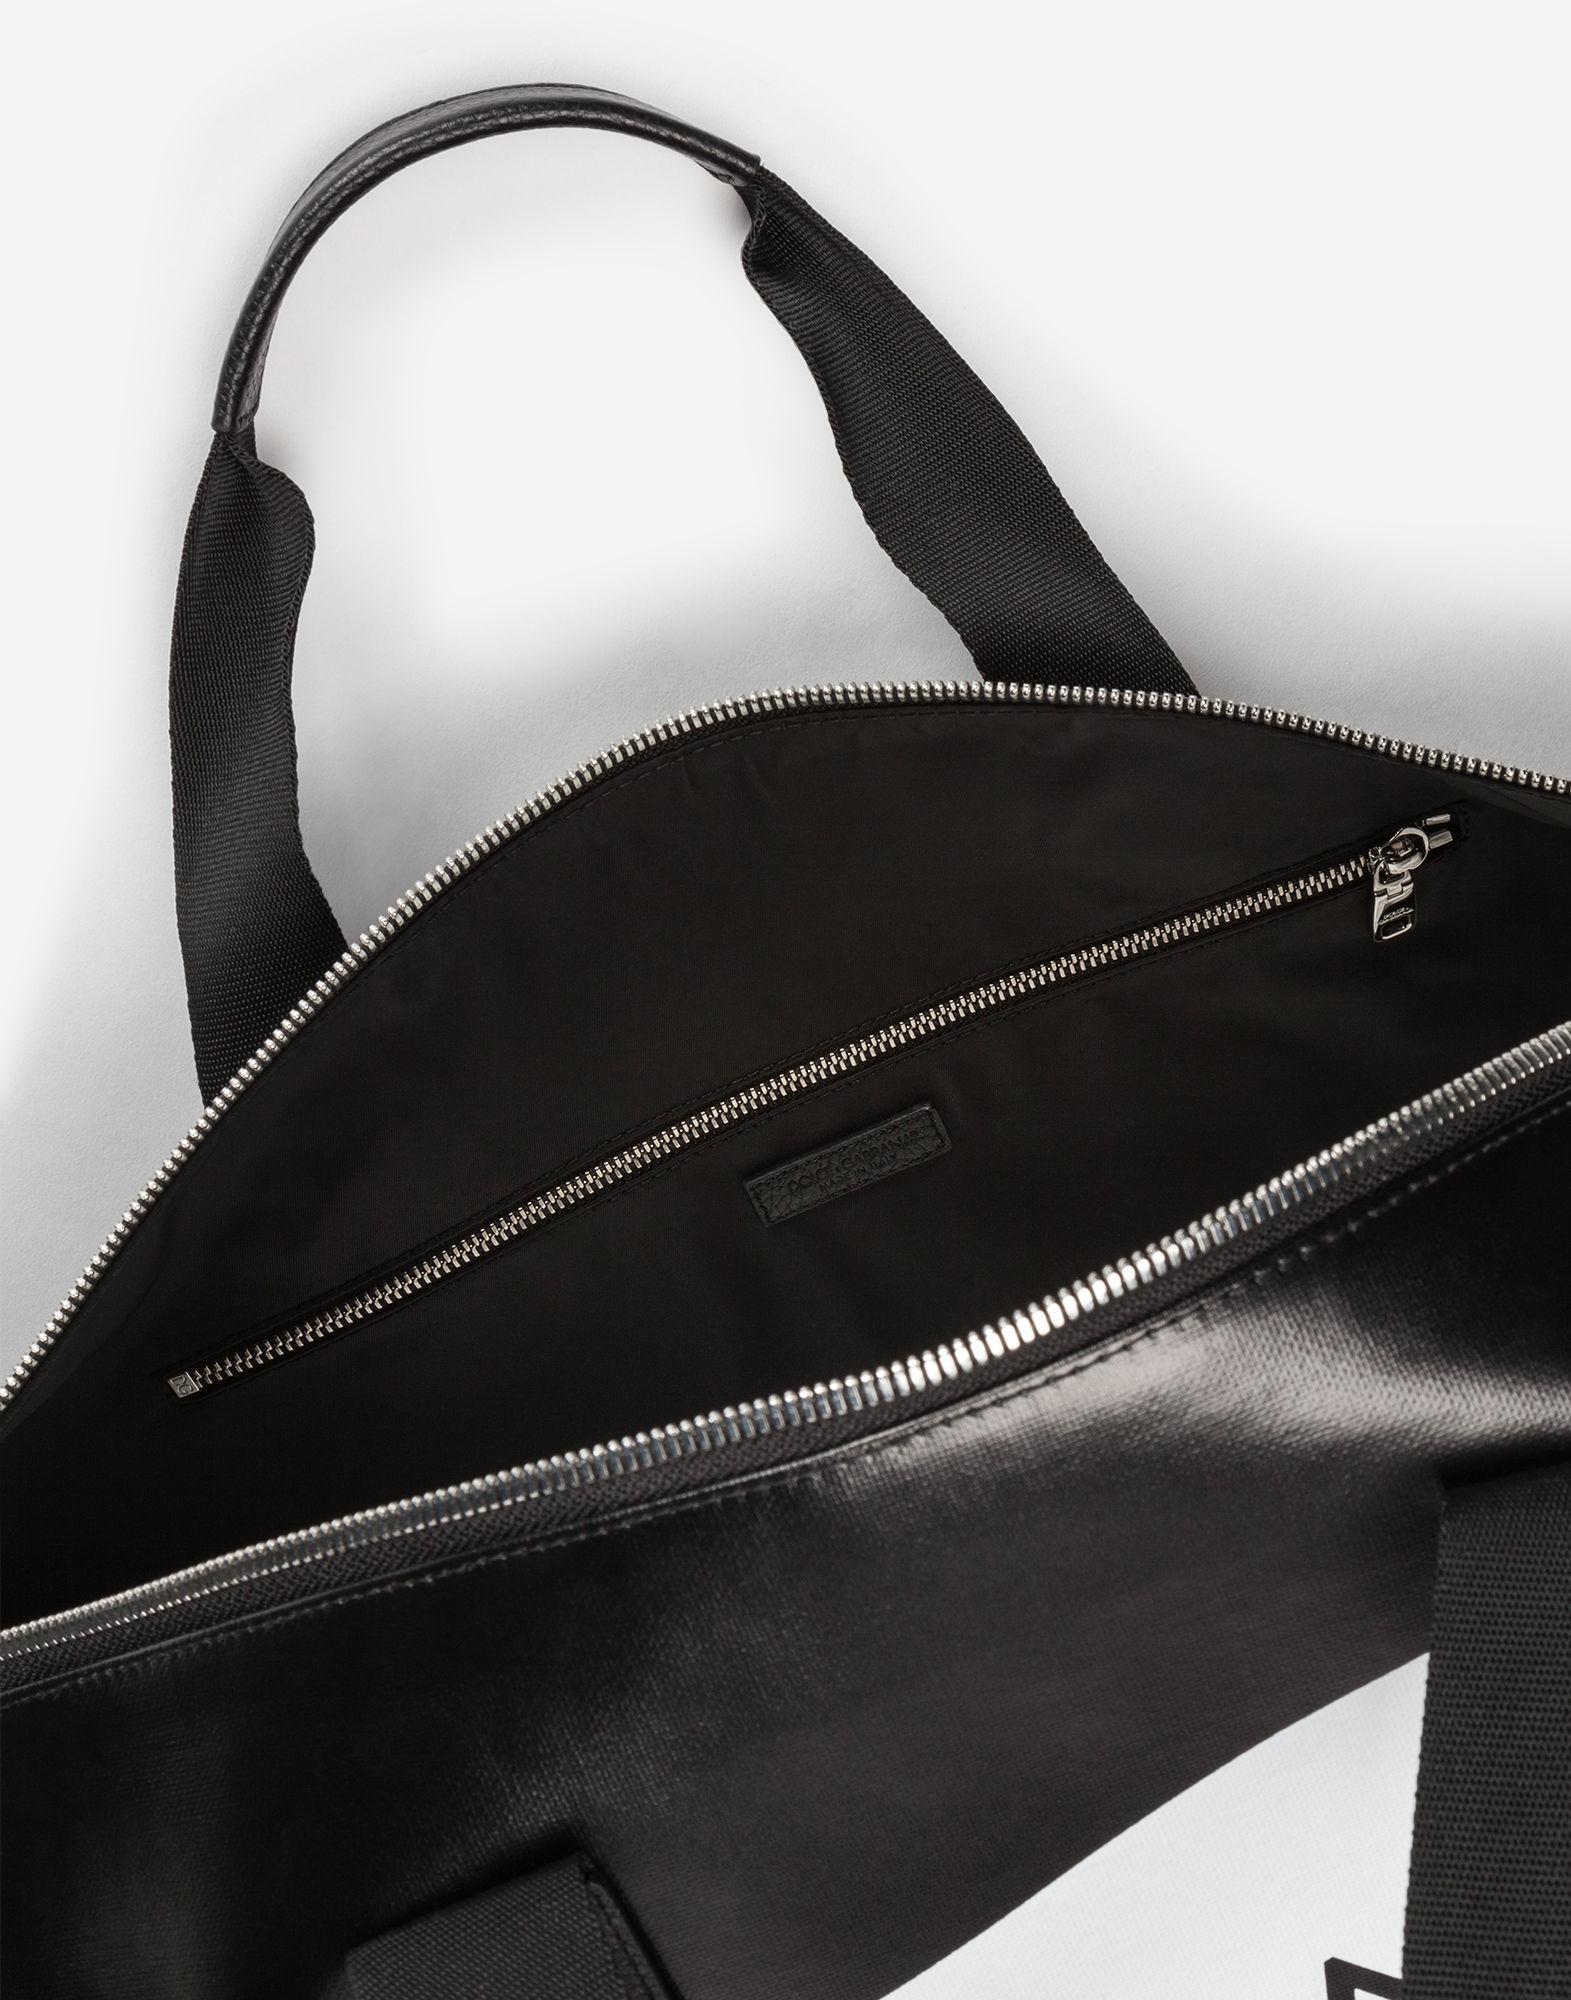 c0725160bd36 Dolce   Gabbana Coated Canvas Travel Bag in Black for Men - Lyst